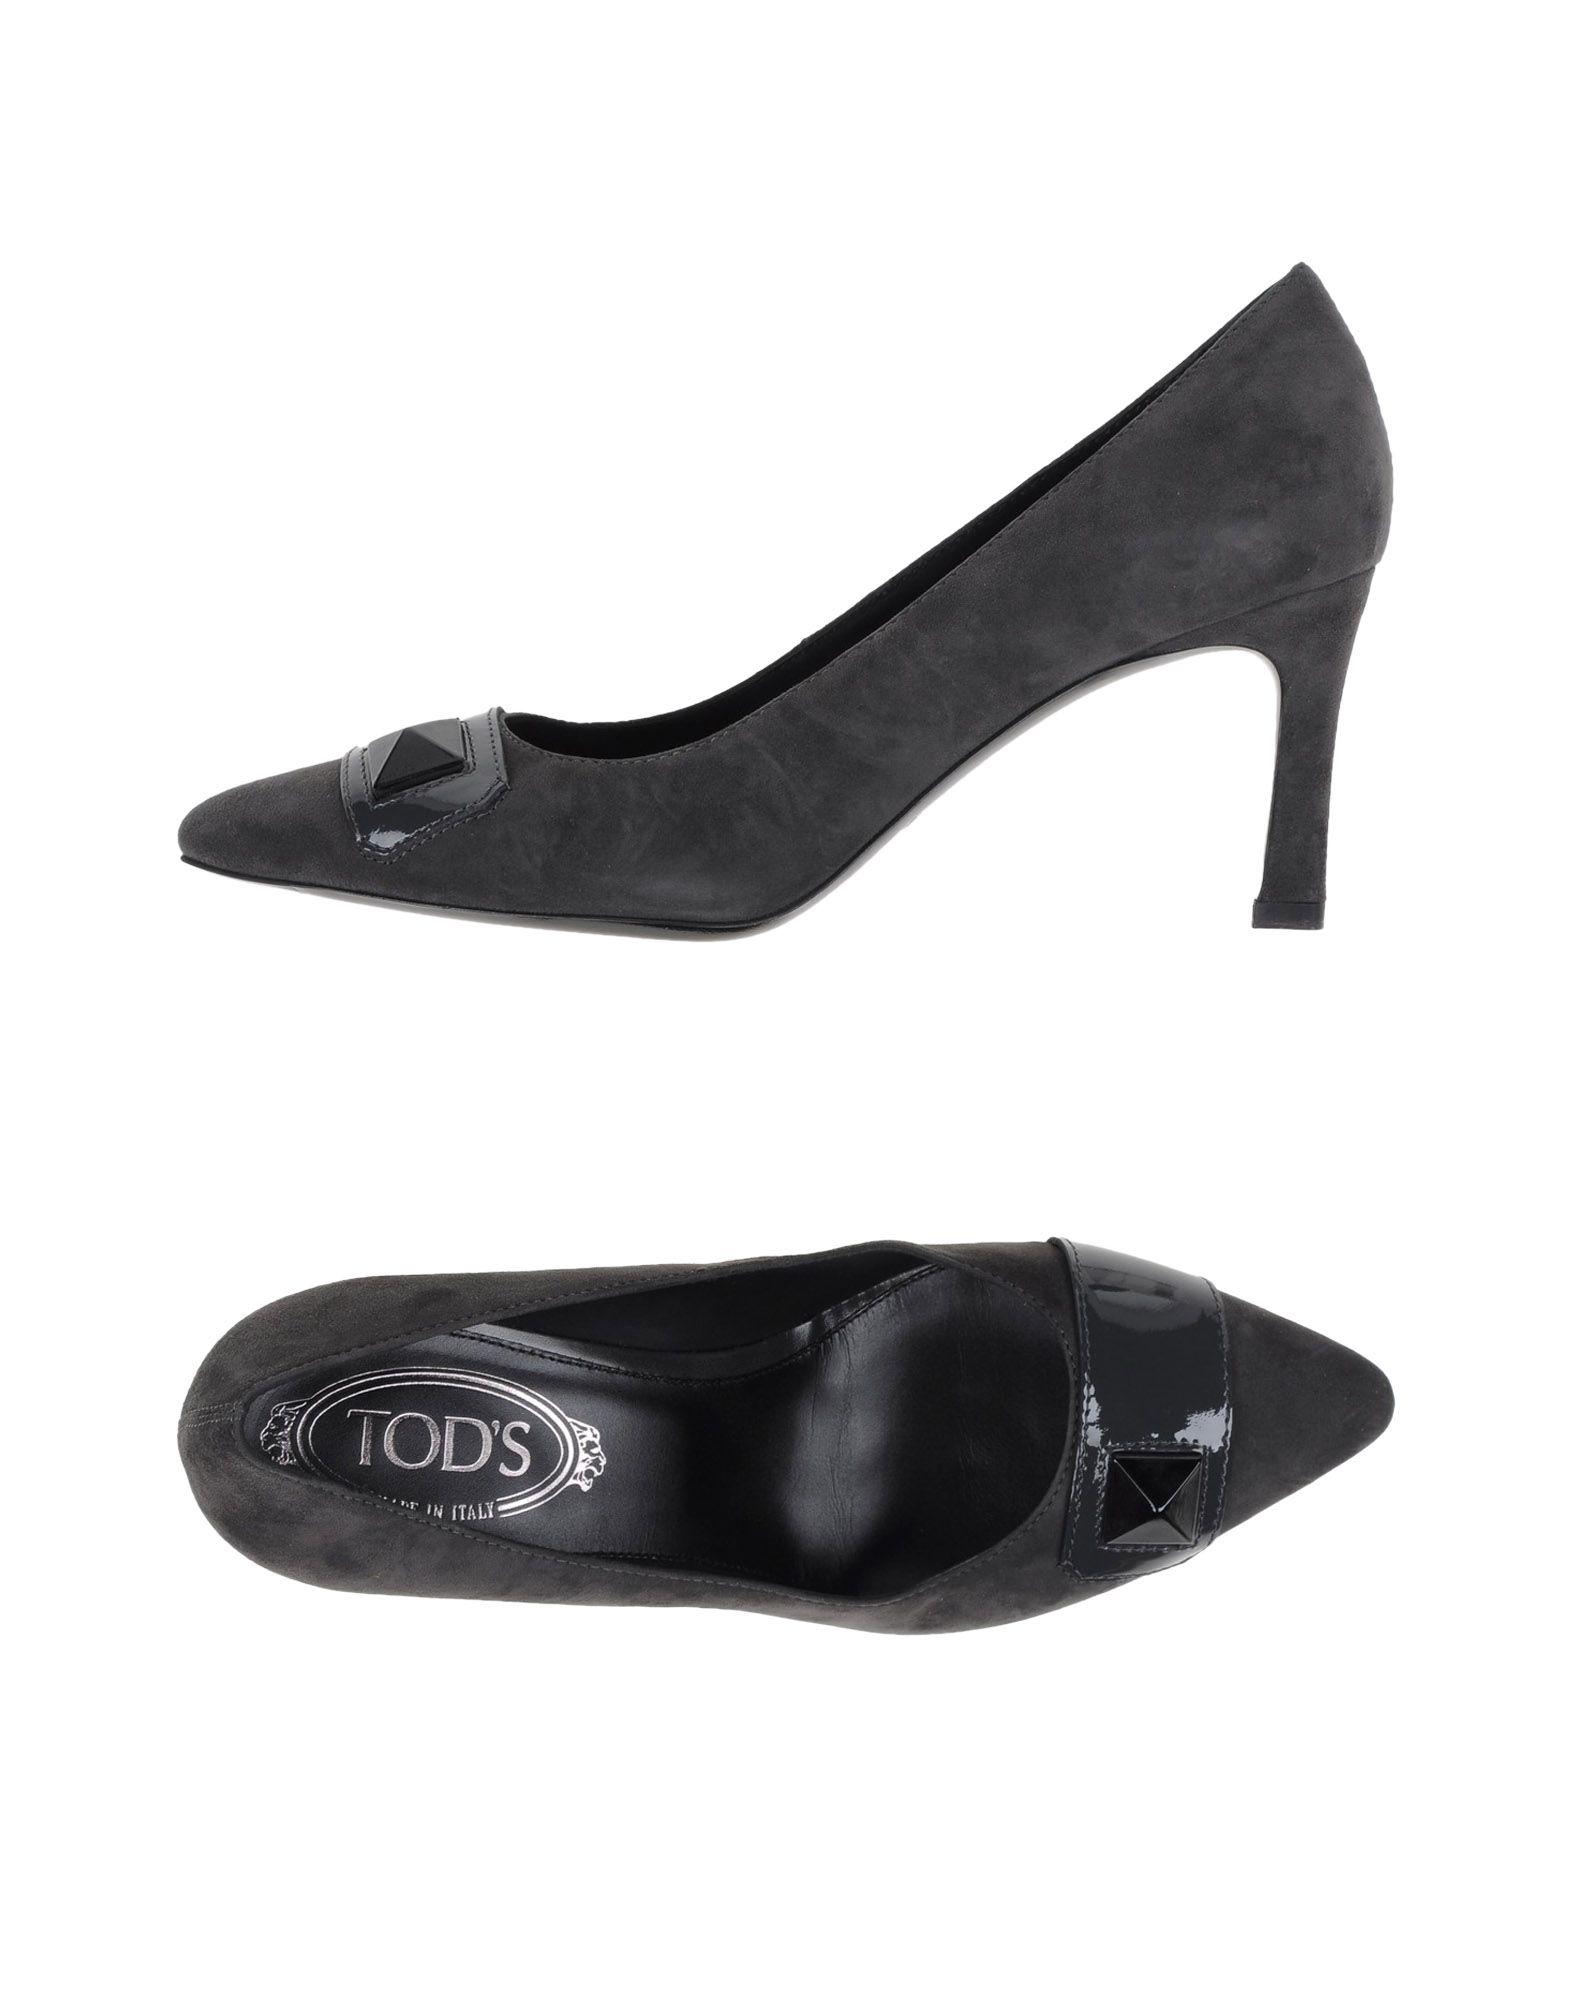 Venta de liquidación de temporada Zapato Tod's De Salón Tod's Zapato Mujer - Salones Tod's  Gris marengo 16d7b4